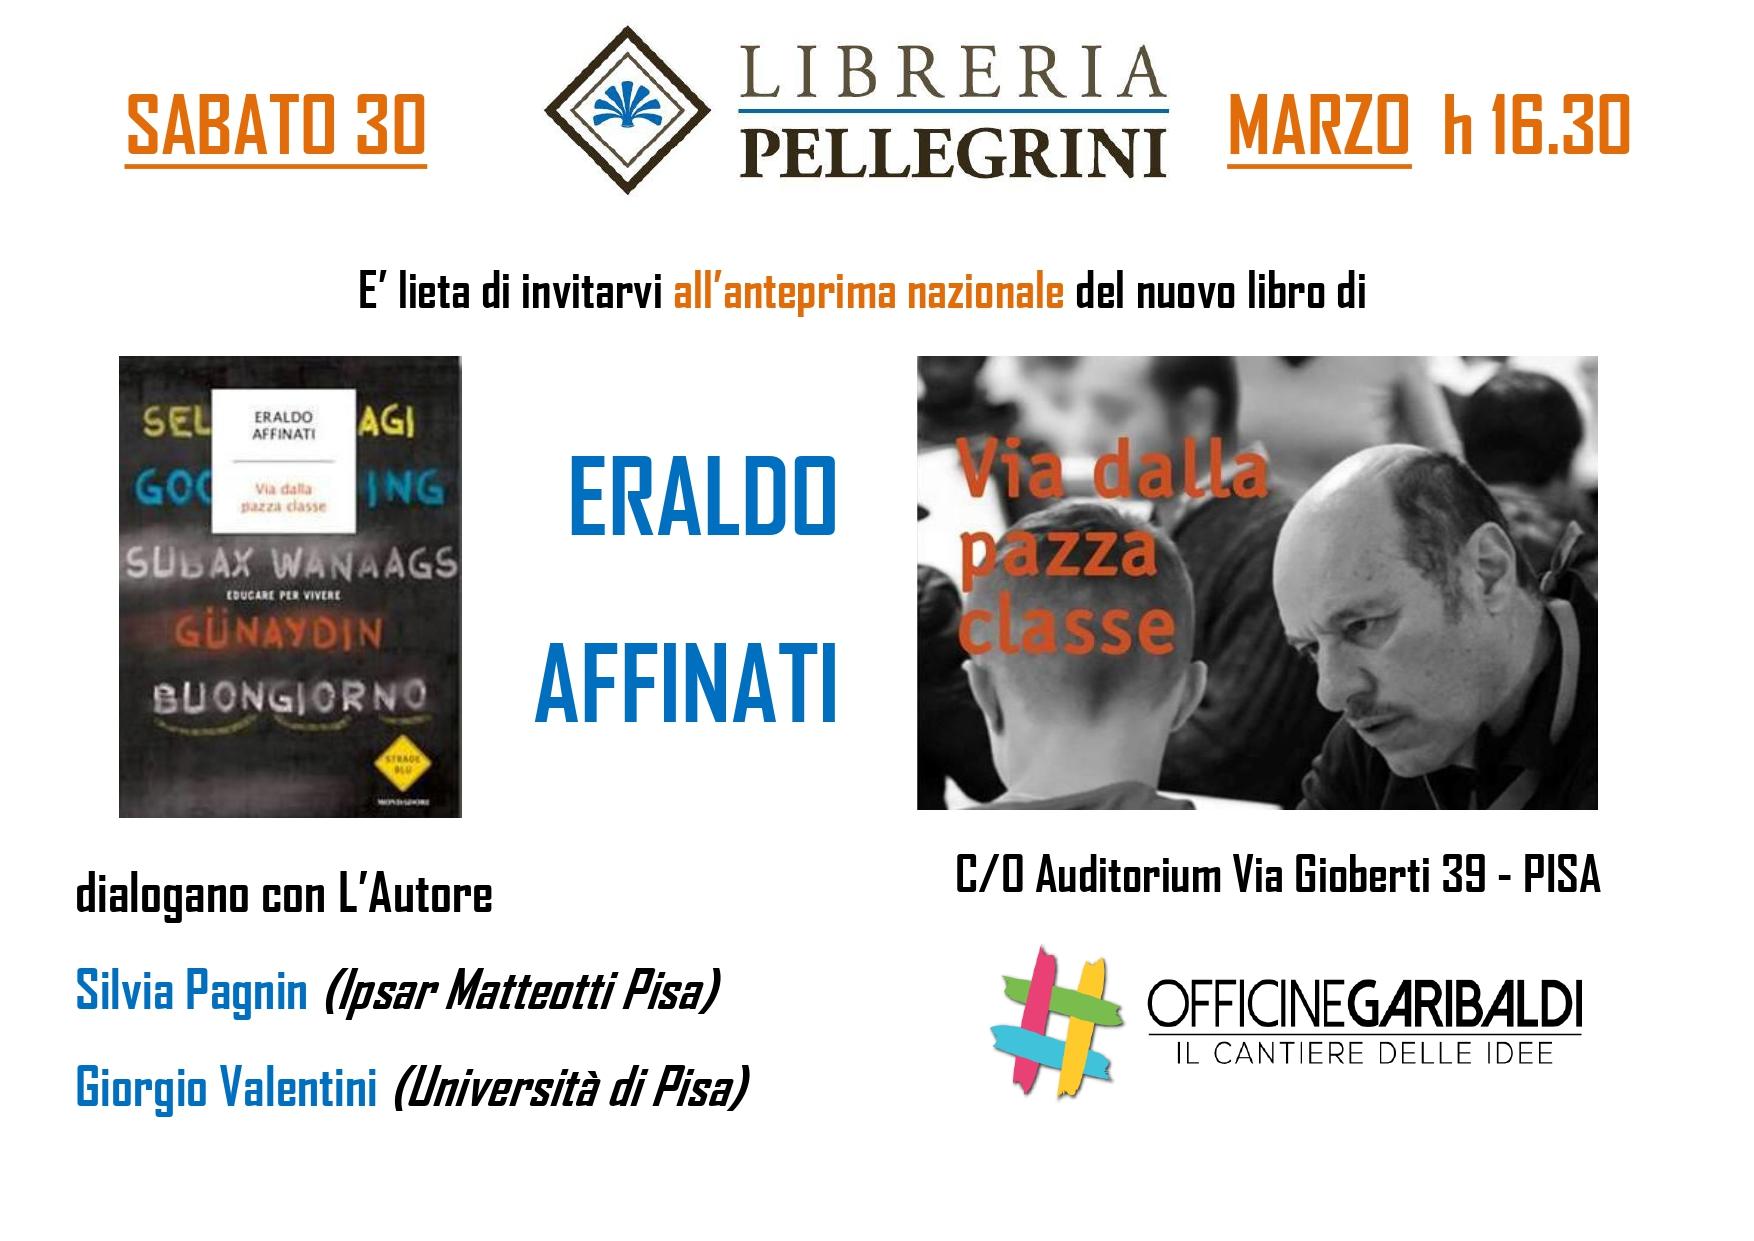 Eraldo Affinati @ Officine Garibaldi – con Libreria Pellegrini